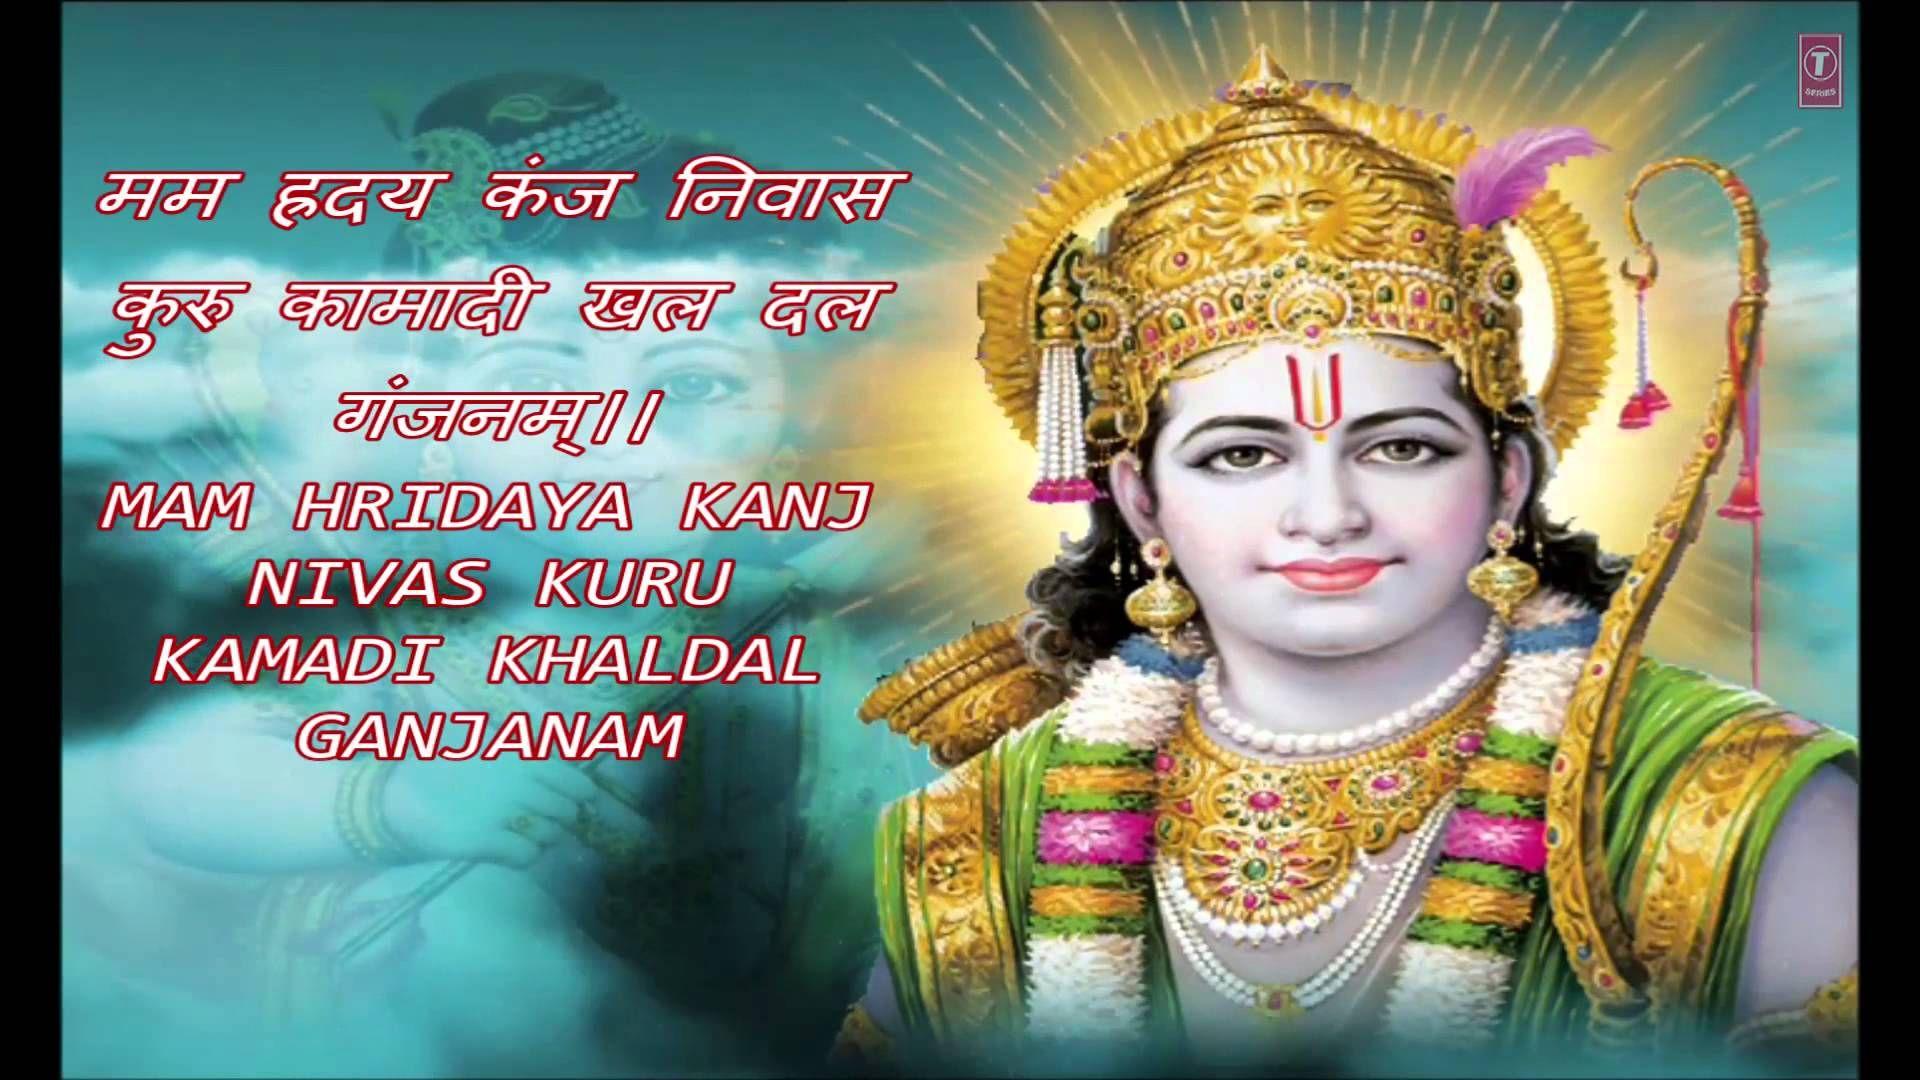 Shri Ram Stuti With Lyrics Shri Ram Chandra Kripalu Bhajuman By Nitin M Ram Bhajan Chandra Ram